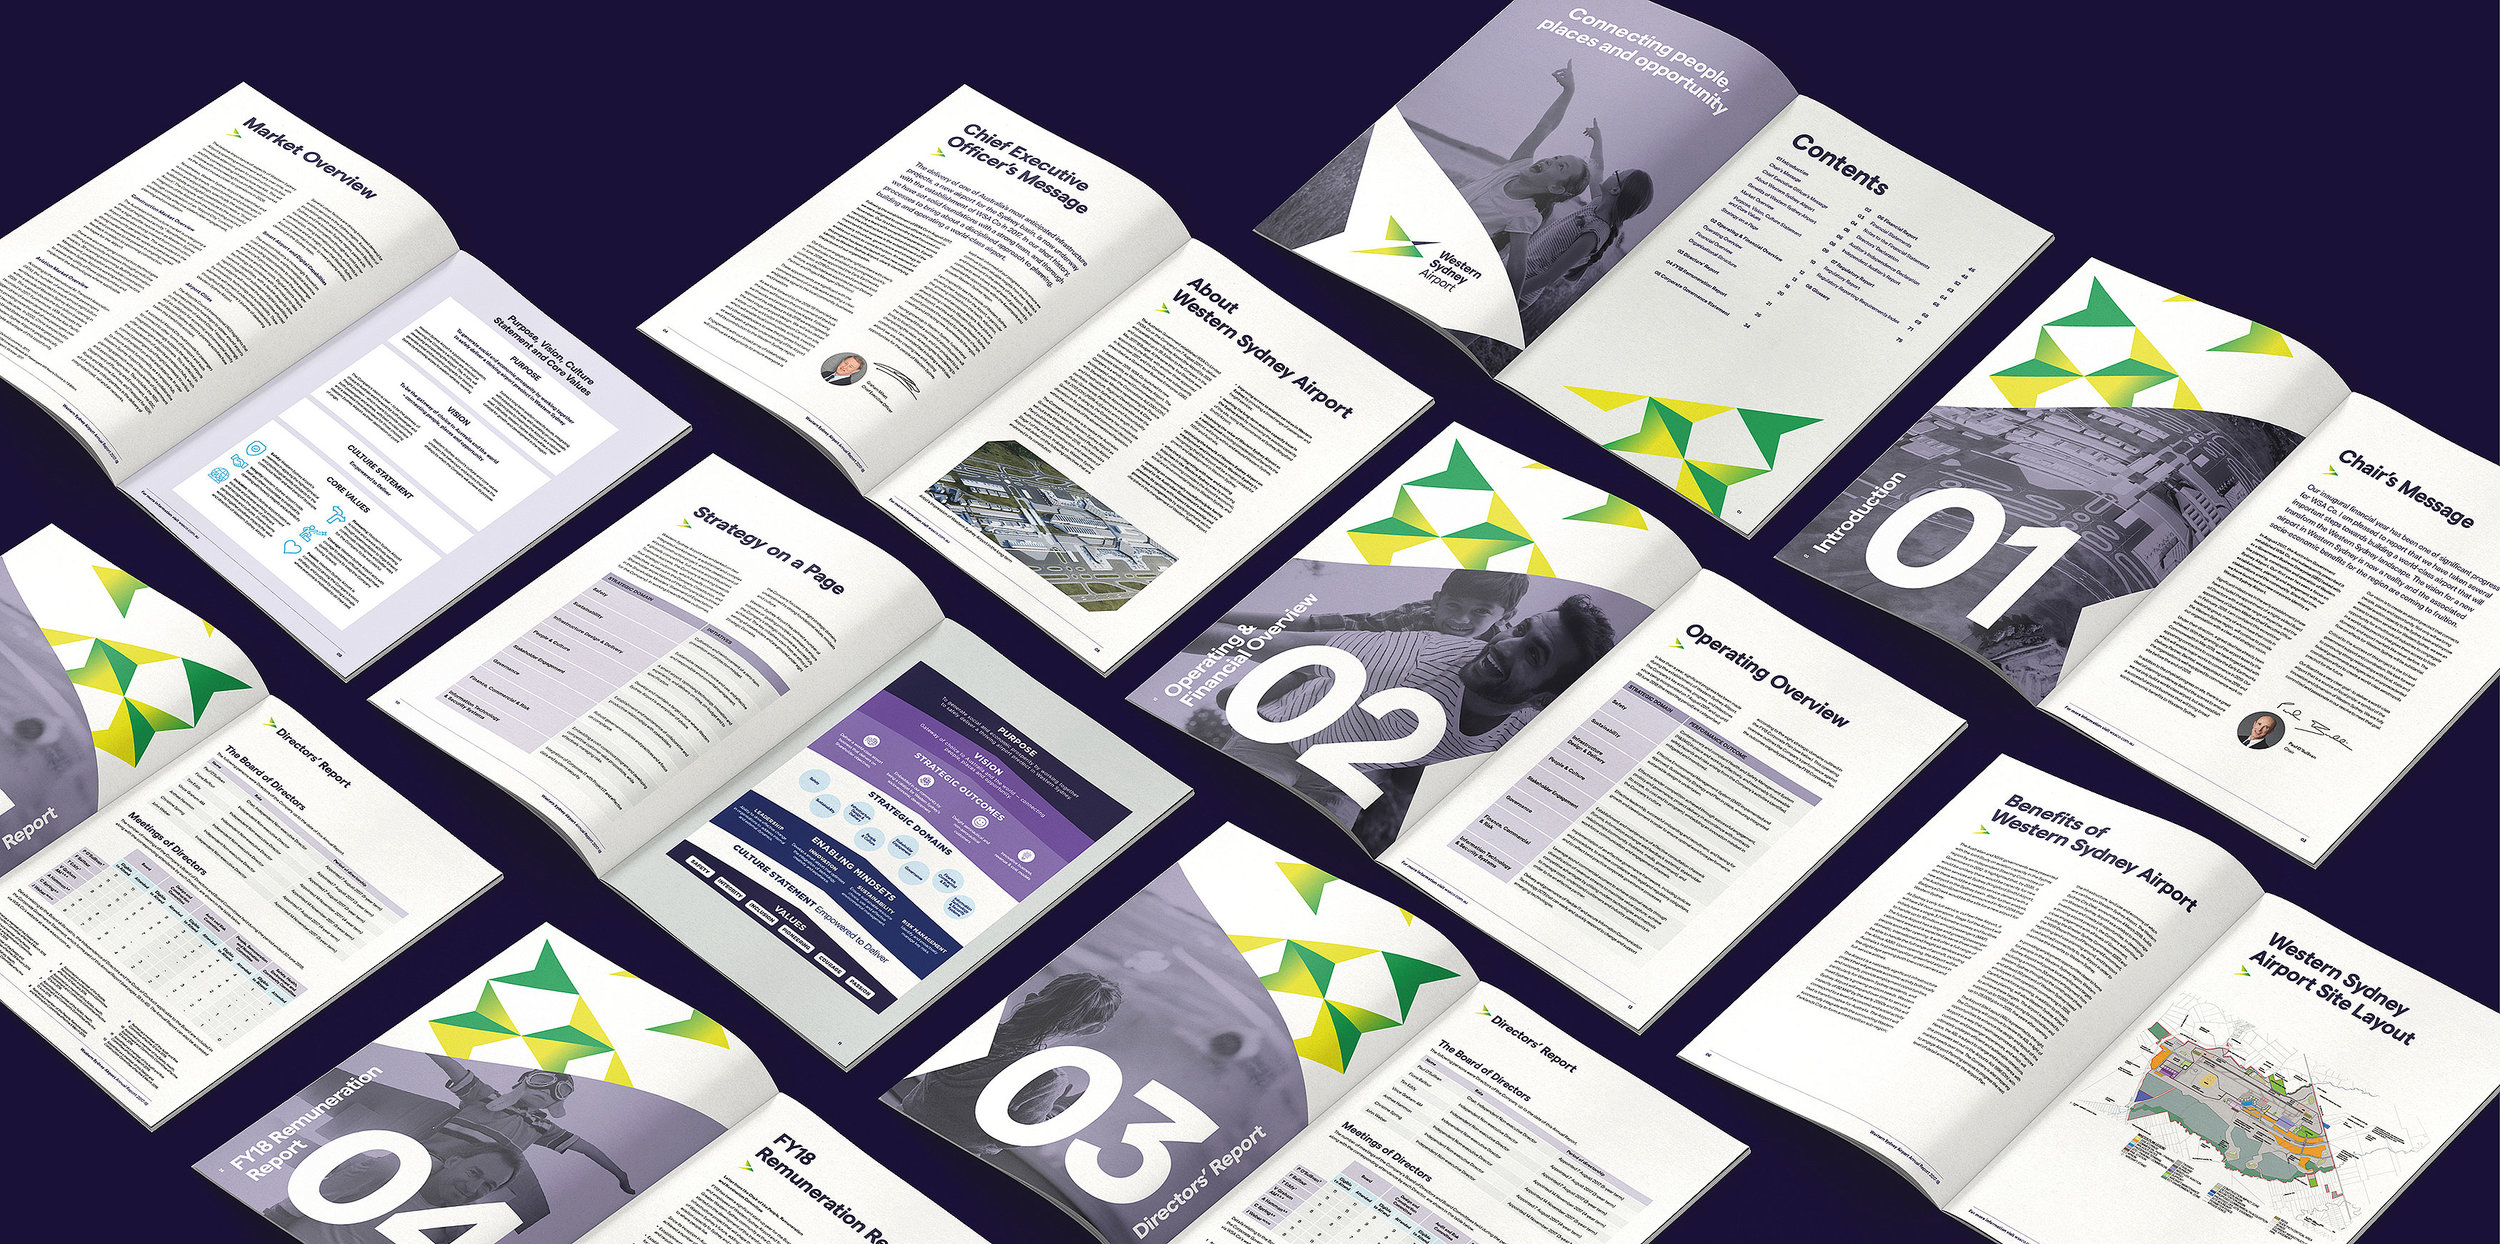 Western-Sydney-Airport-Annual-Report-Design-07.jpg